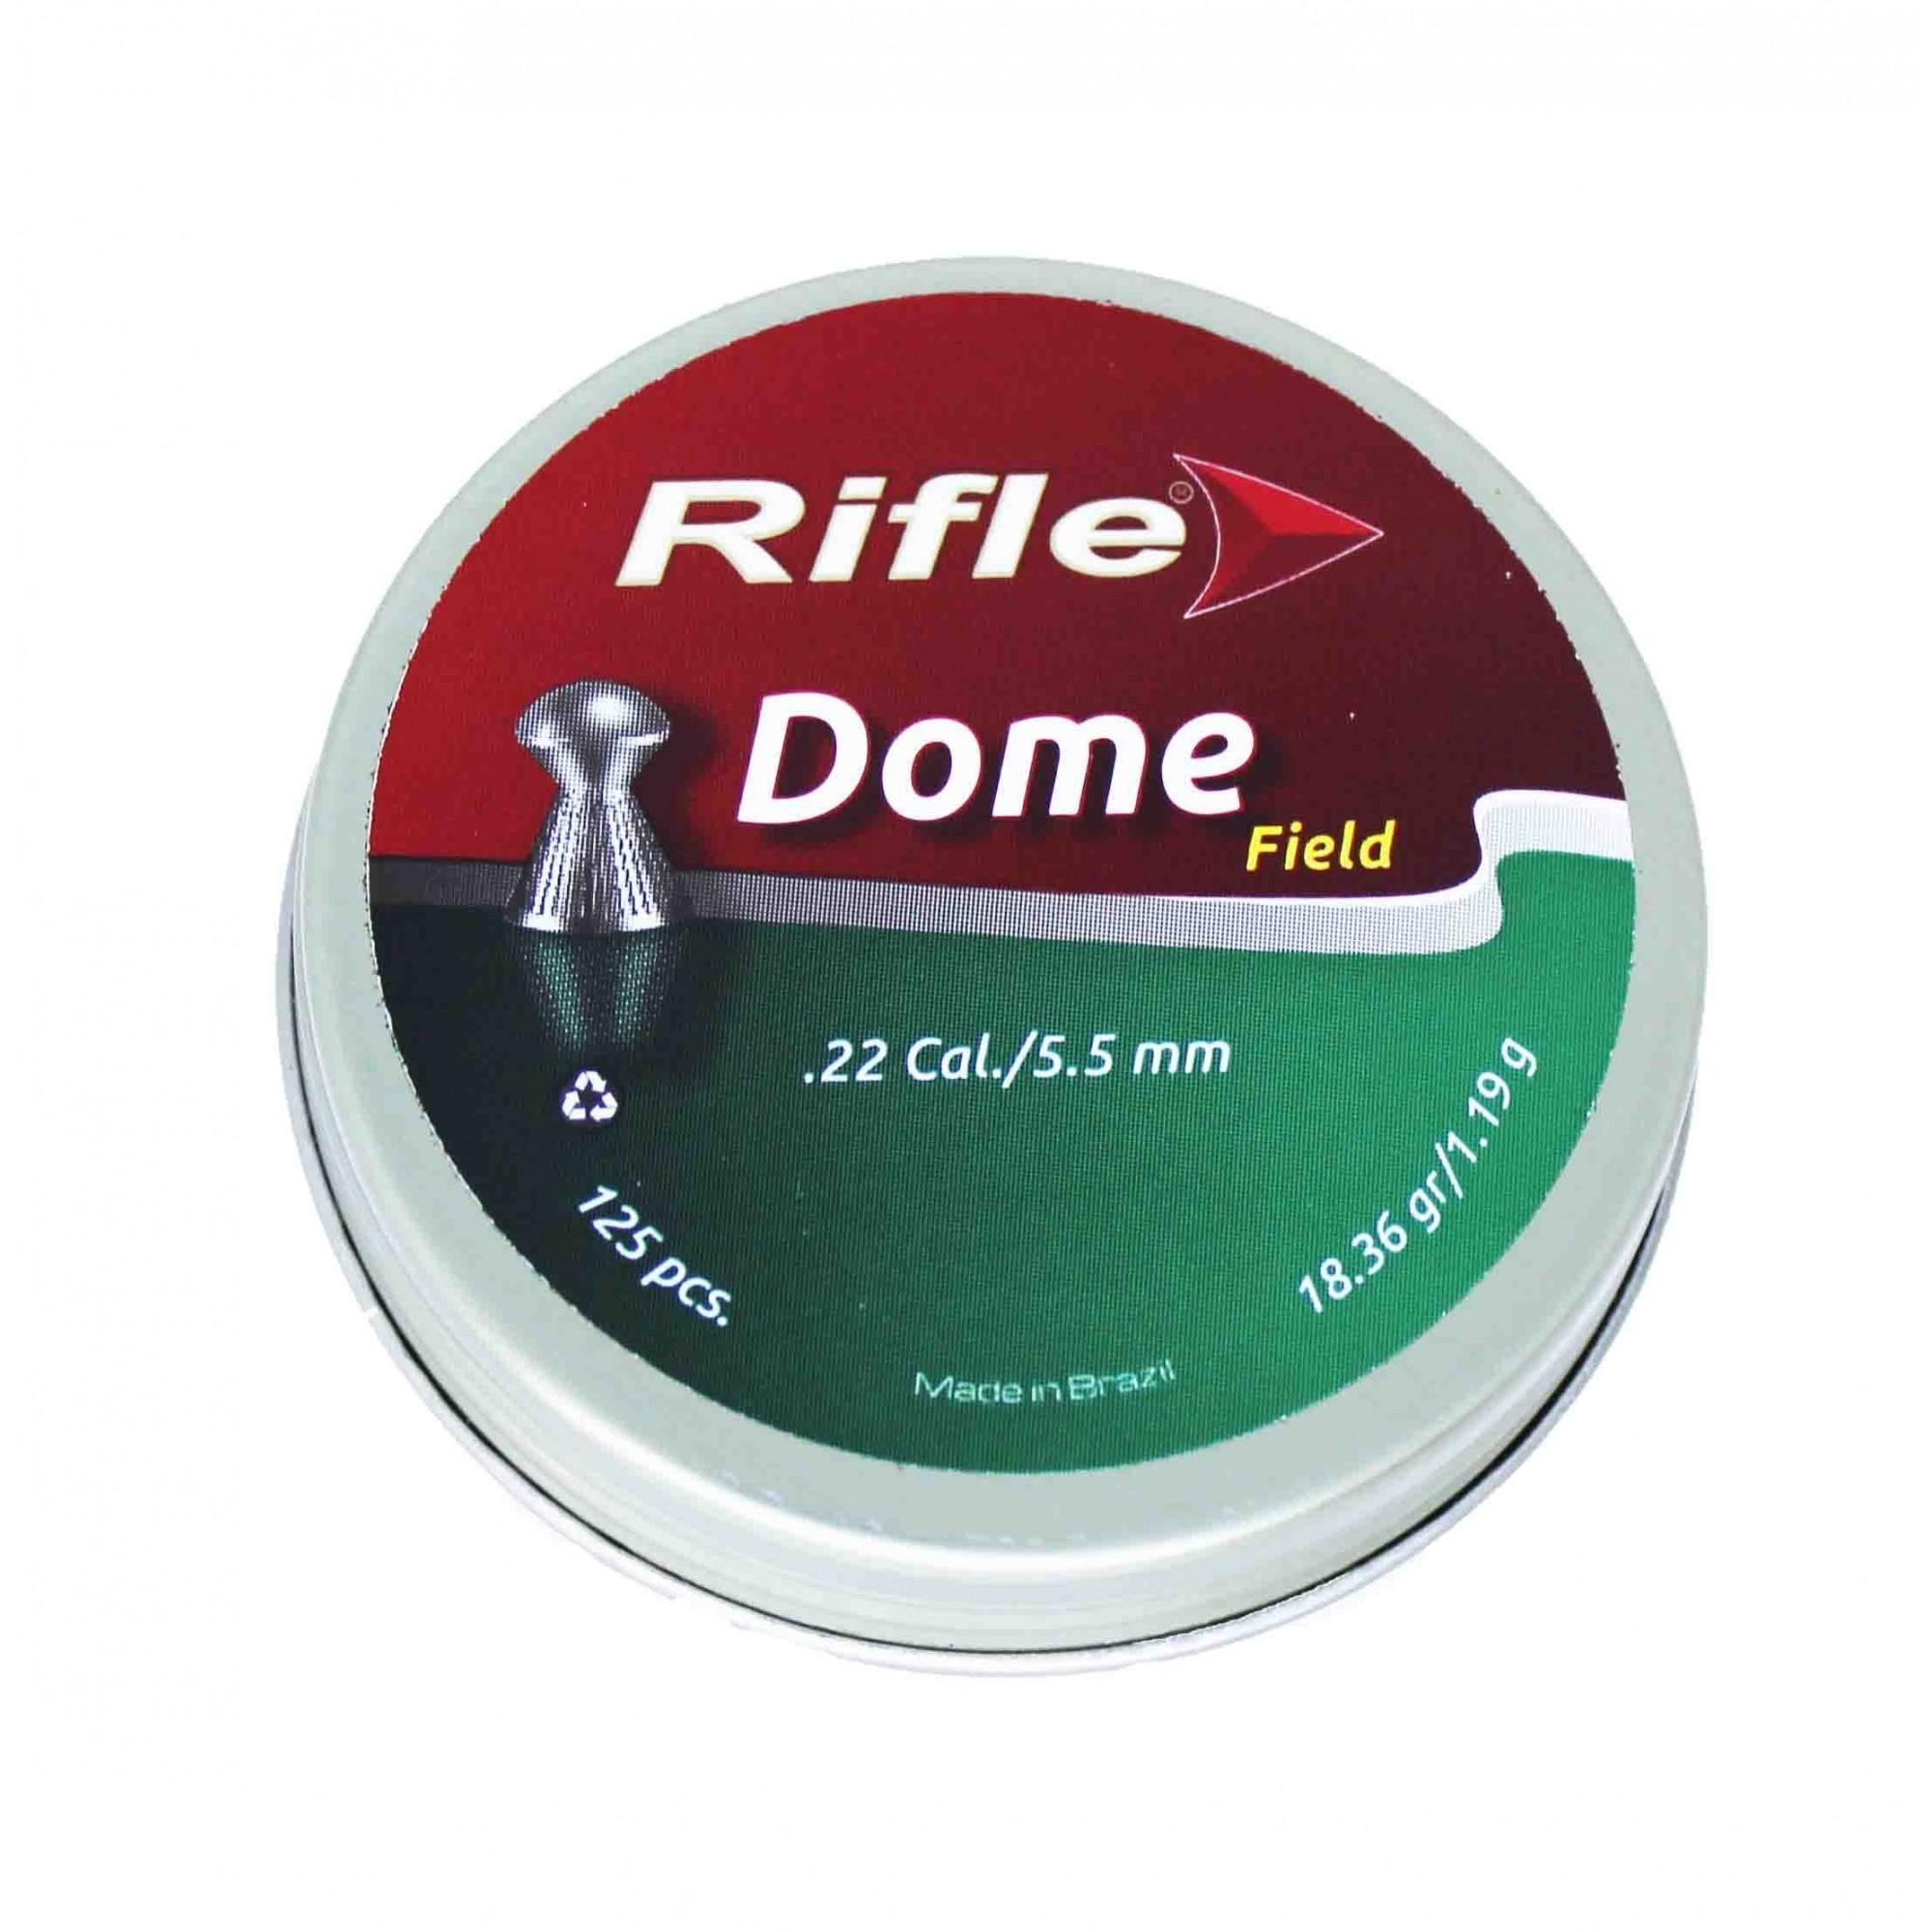 Chumbinho Rifle Dome Field 5.5mm .22 Cal 125 Und.